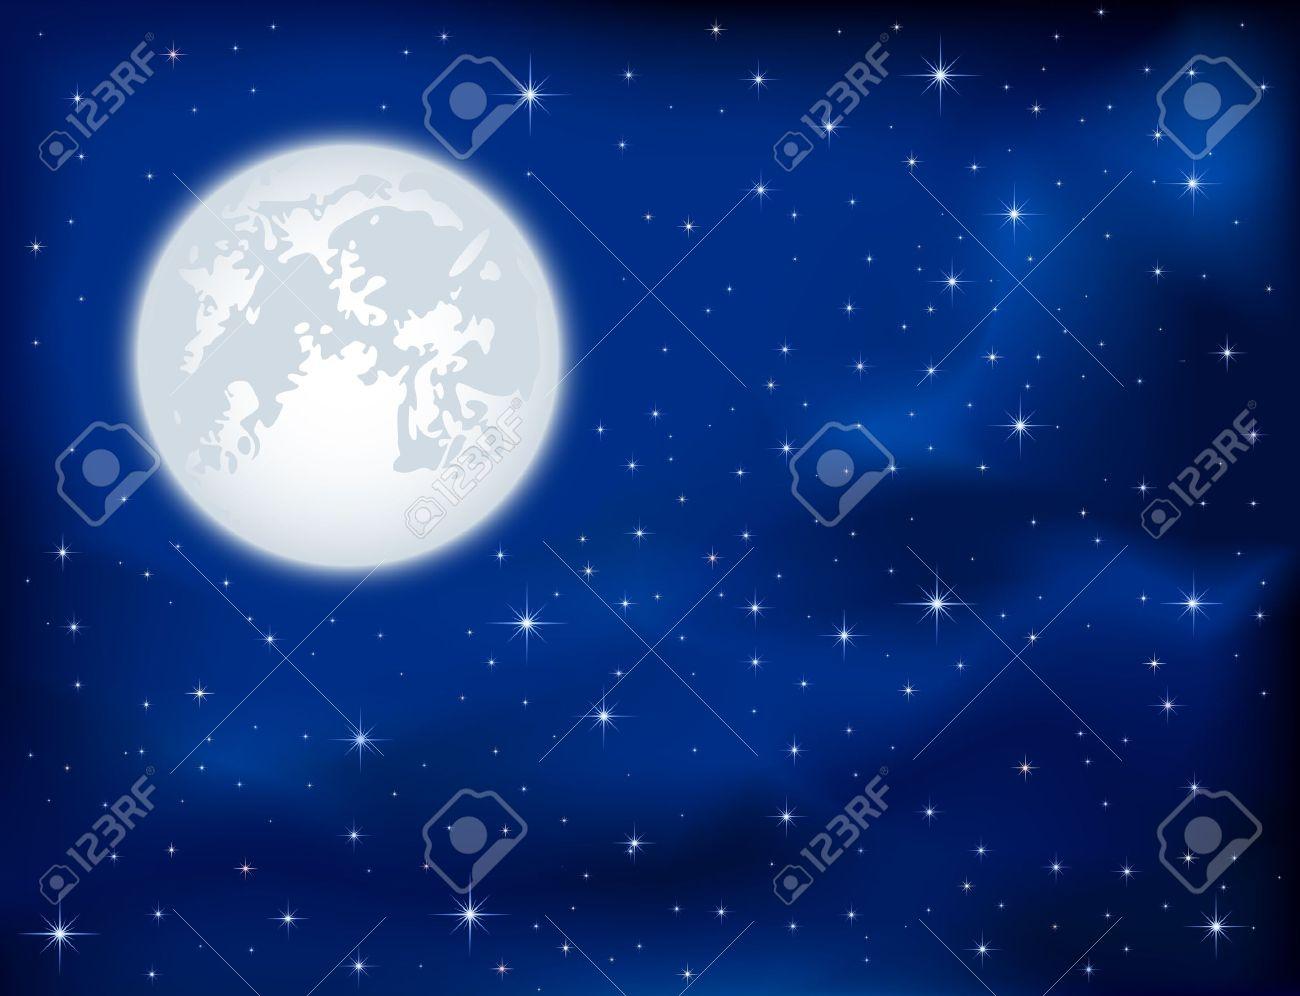 Night background, shining Stars and Moon on dark blue sky, illustration Stock Vector - 12445837